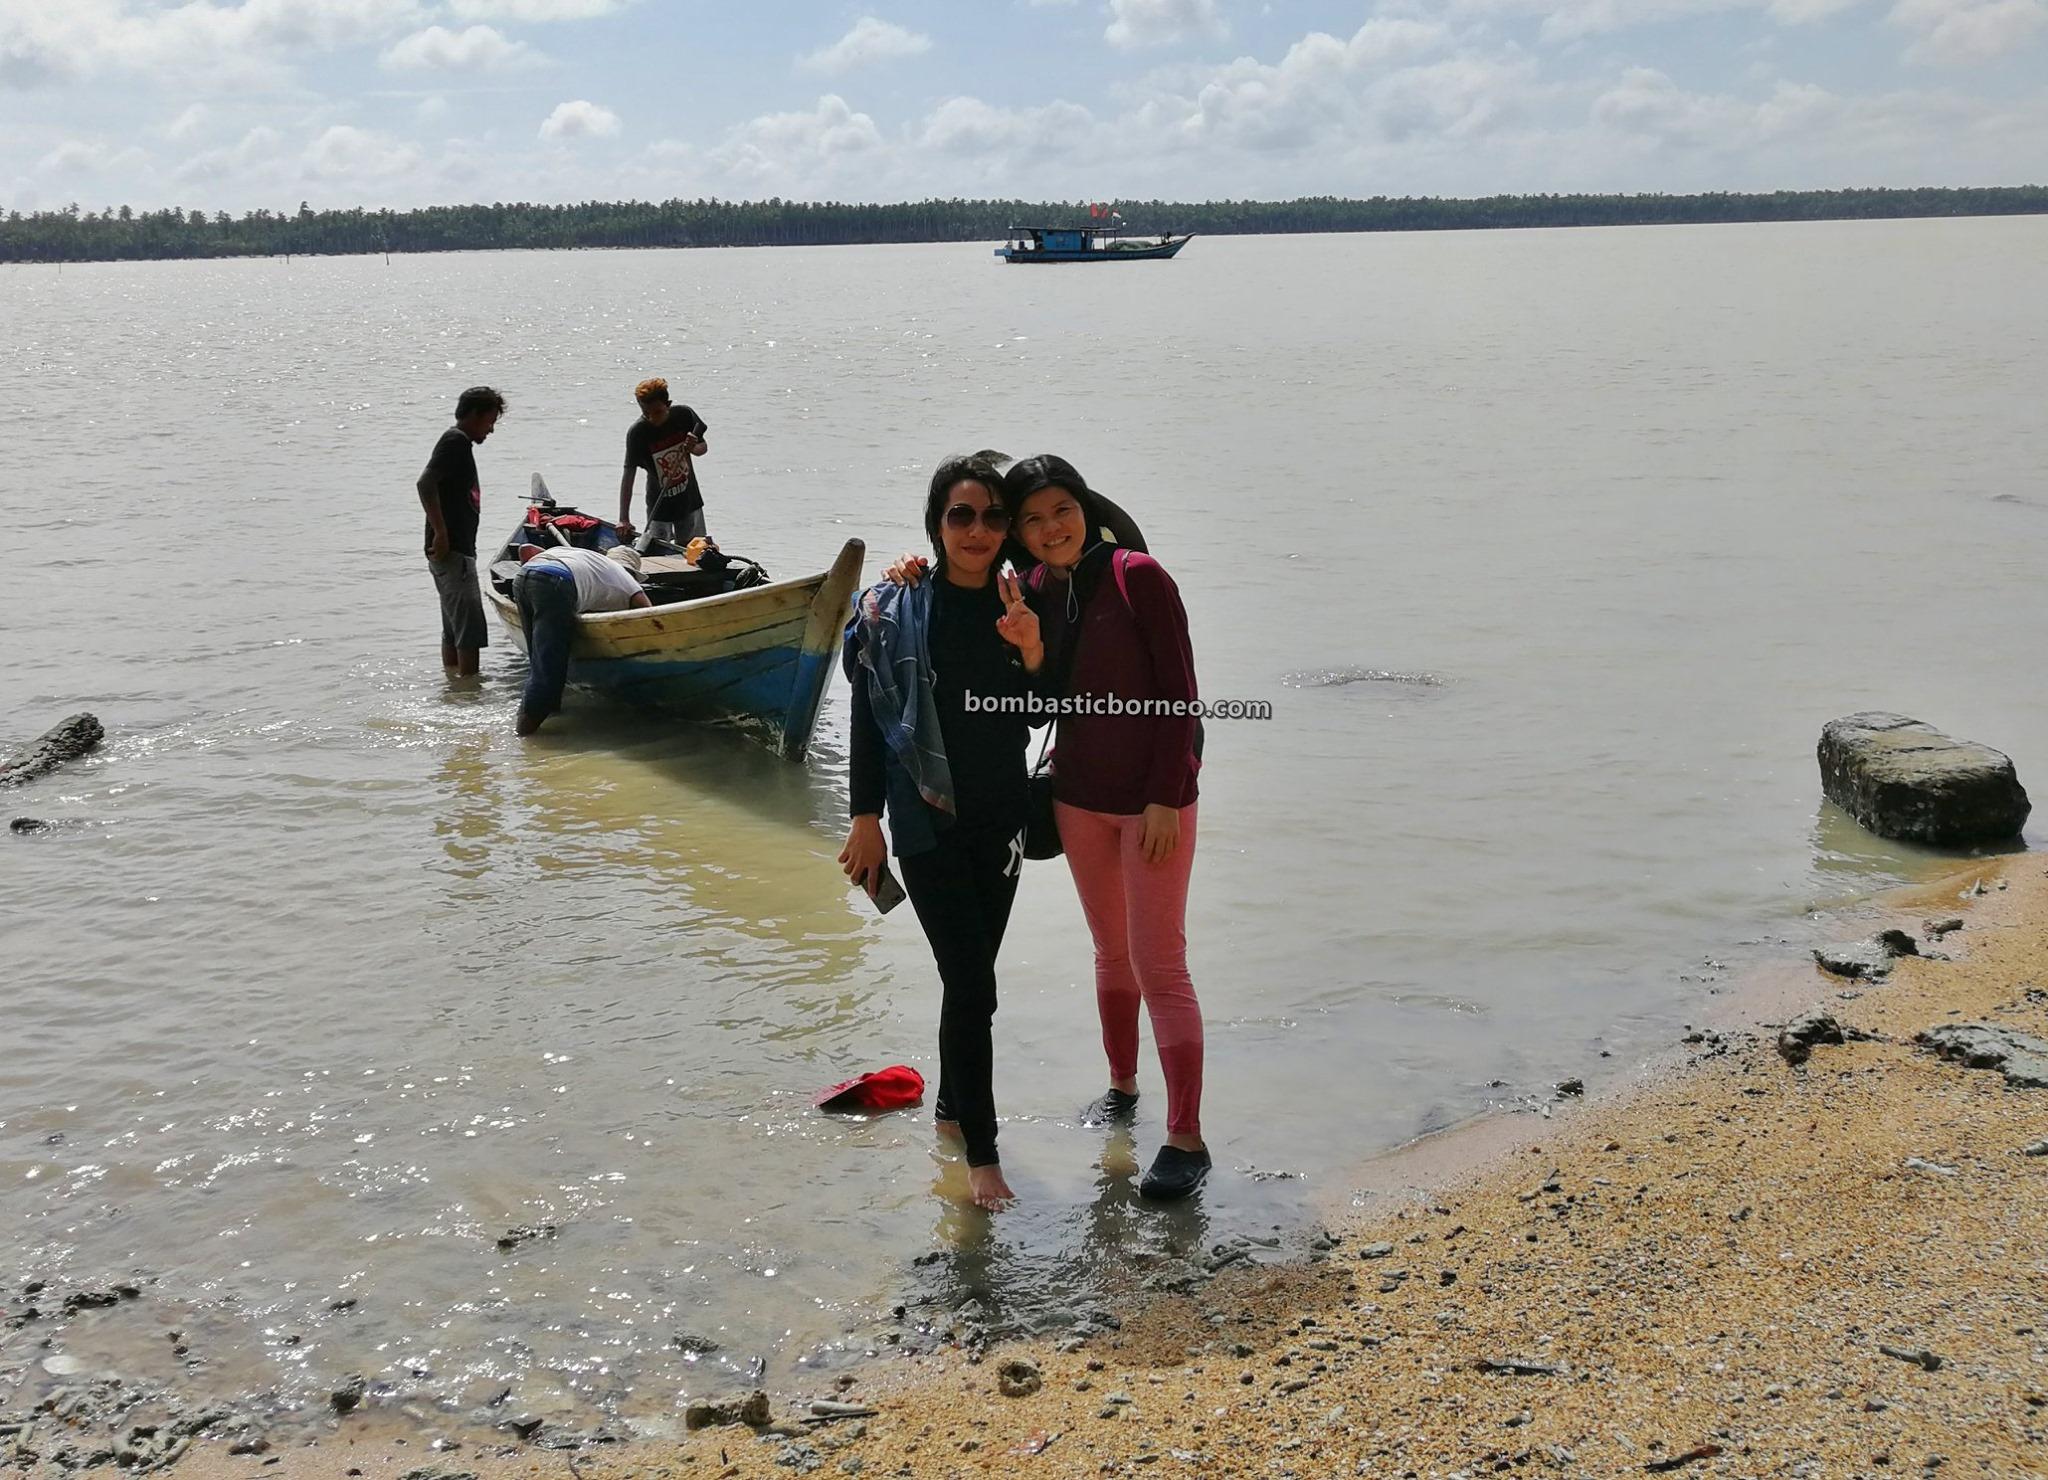 Kerang, mussel, Pantai Putri Seraii, adventure, nature, Malay fishing village, Kampung Nelayan Melayu, Jawai Laut, Tourism, tourist attraction, backpackers, Trans Borneo, 穿越婆罗洲游踪, 印尼西加里曼丹, 三发马来渔村